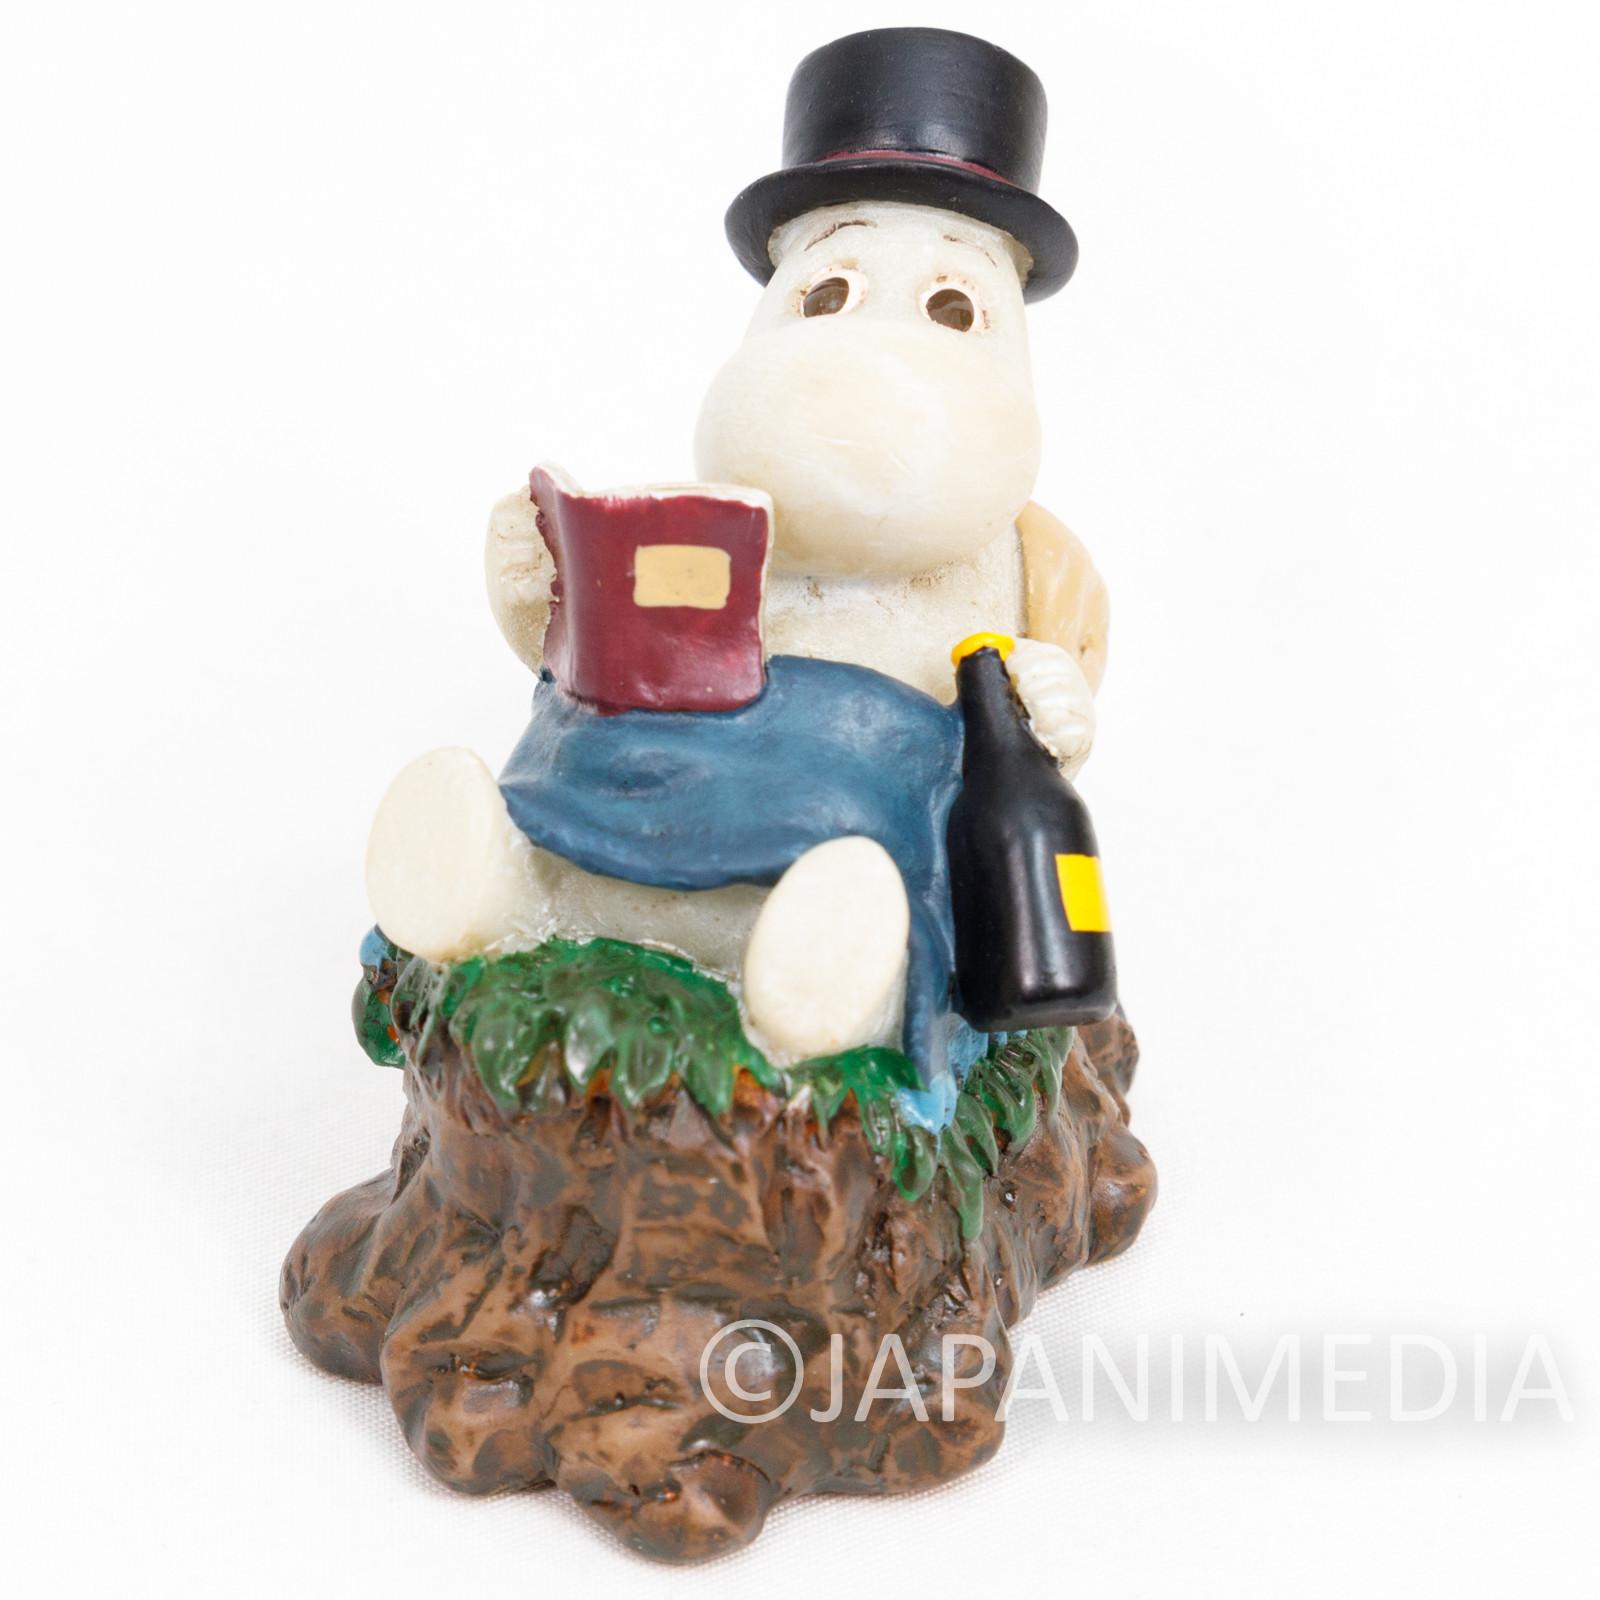 RARE! Moomin Characters Moomin Pappa  Original Comics Ver. Mini Figure Benelic